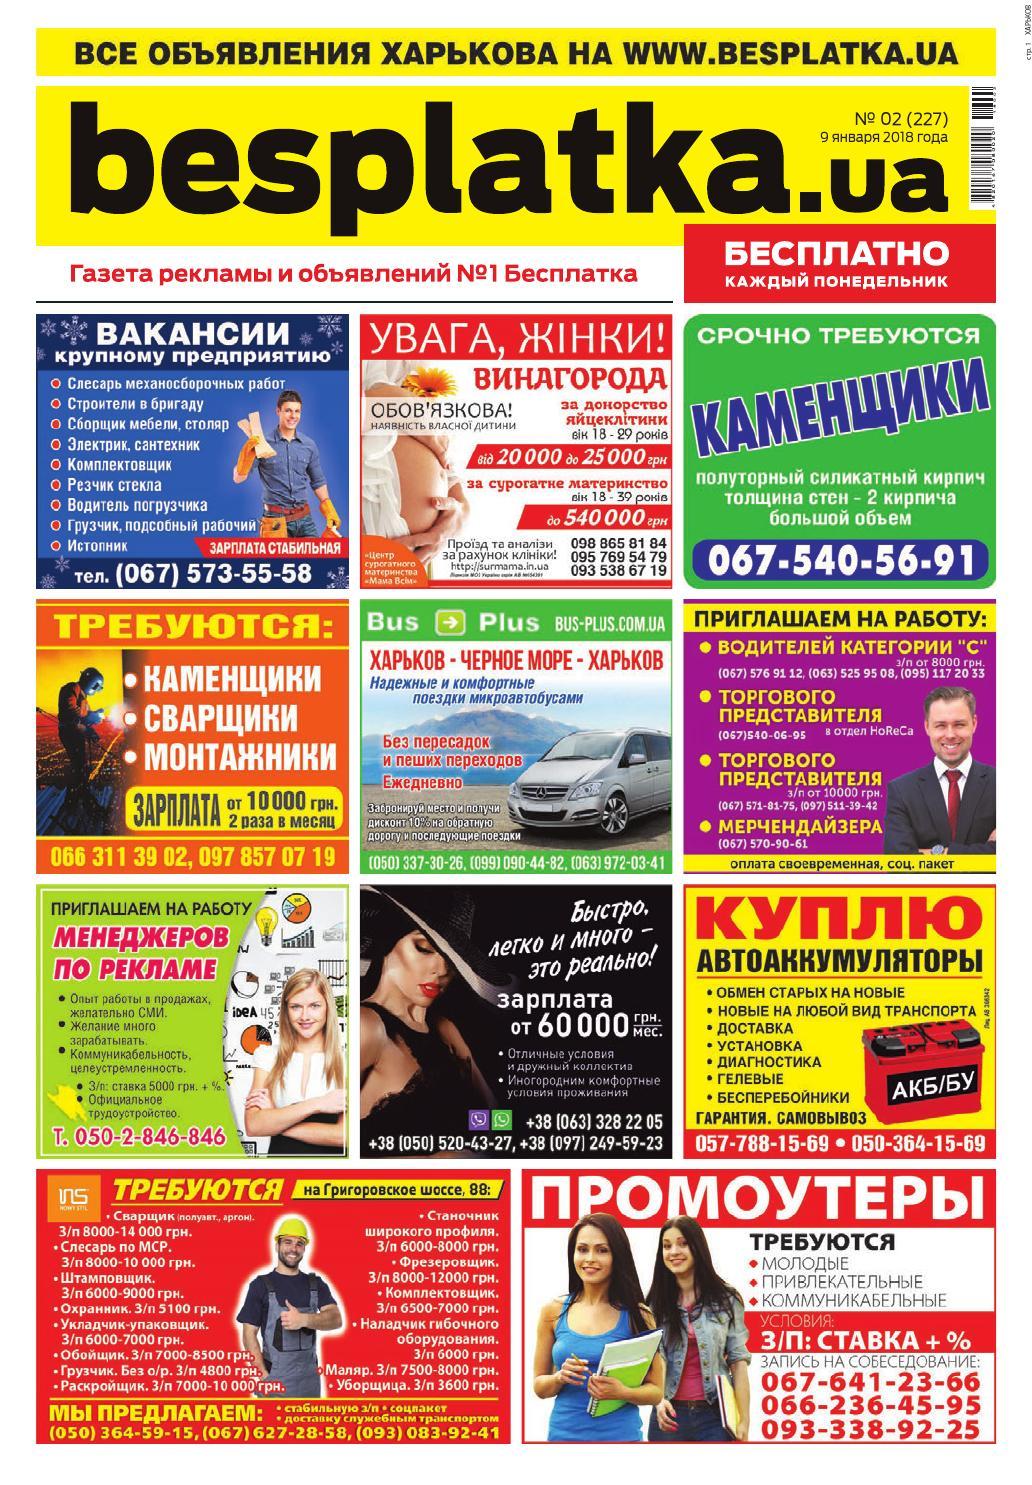 Besplatka  2 Харьков by besplatka ukraine - issuu 53a61236429